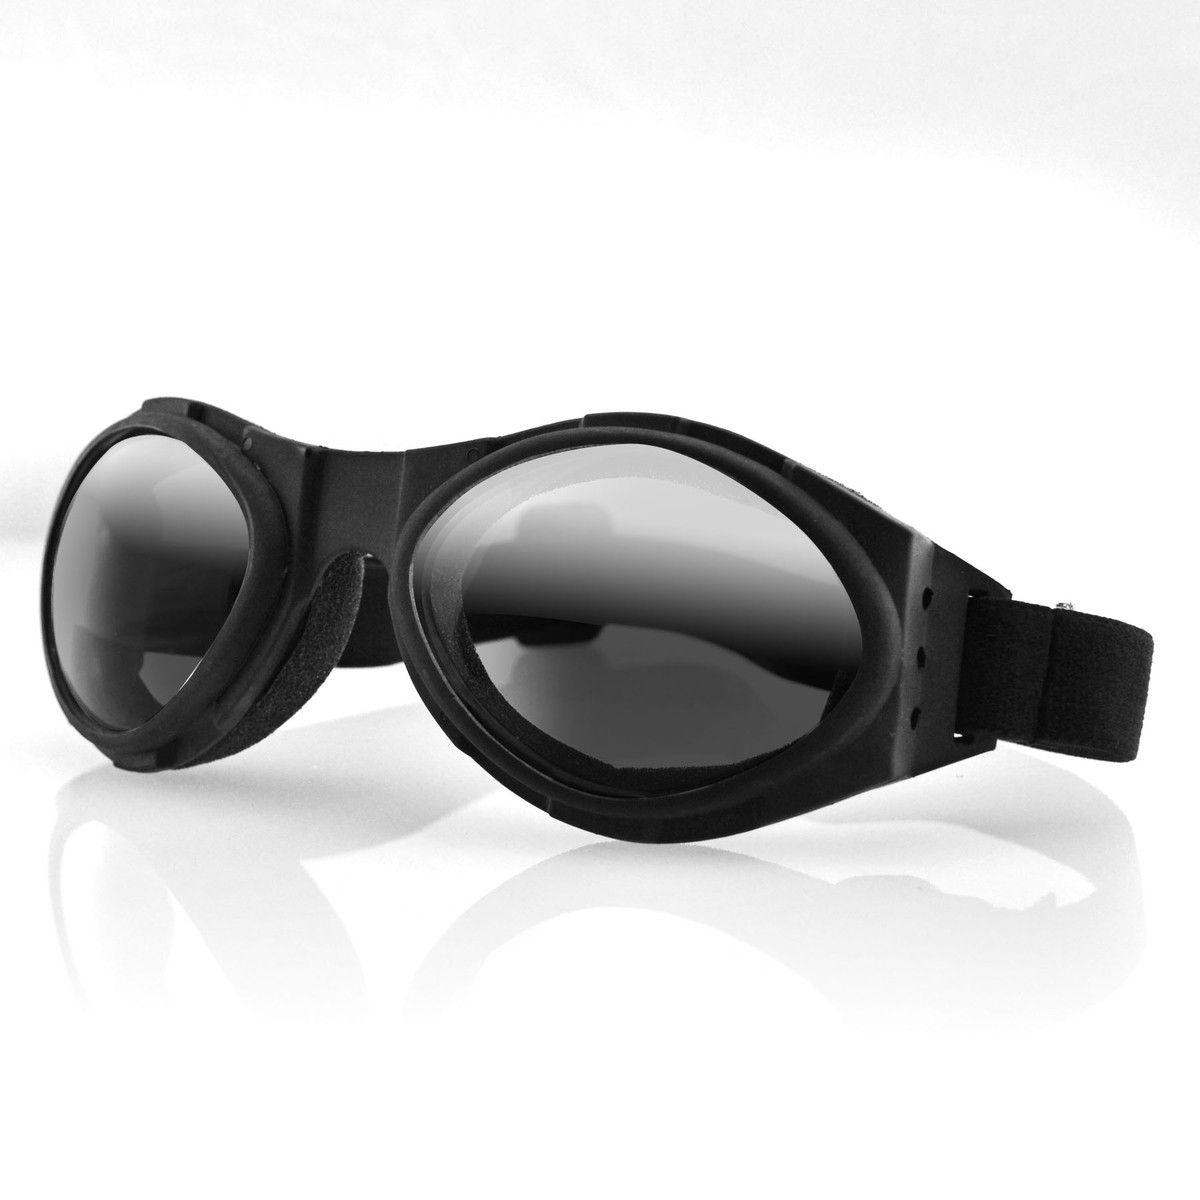 Bobster goggles bugeye goggles lens tactical eyewear